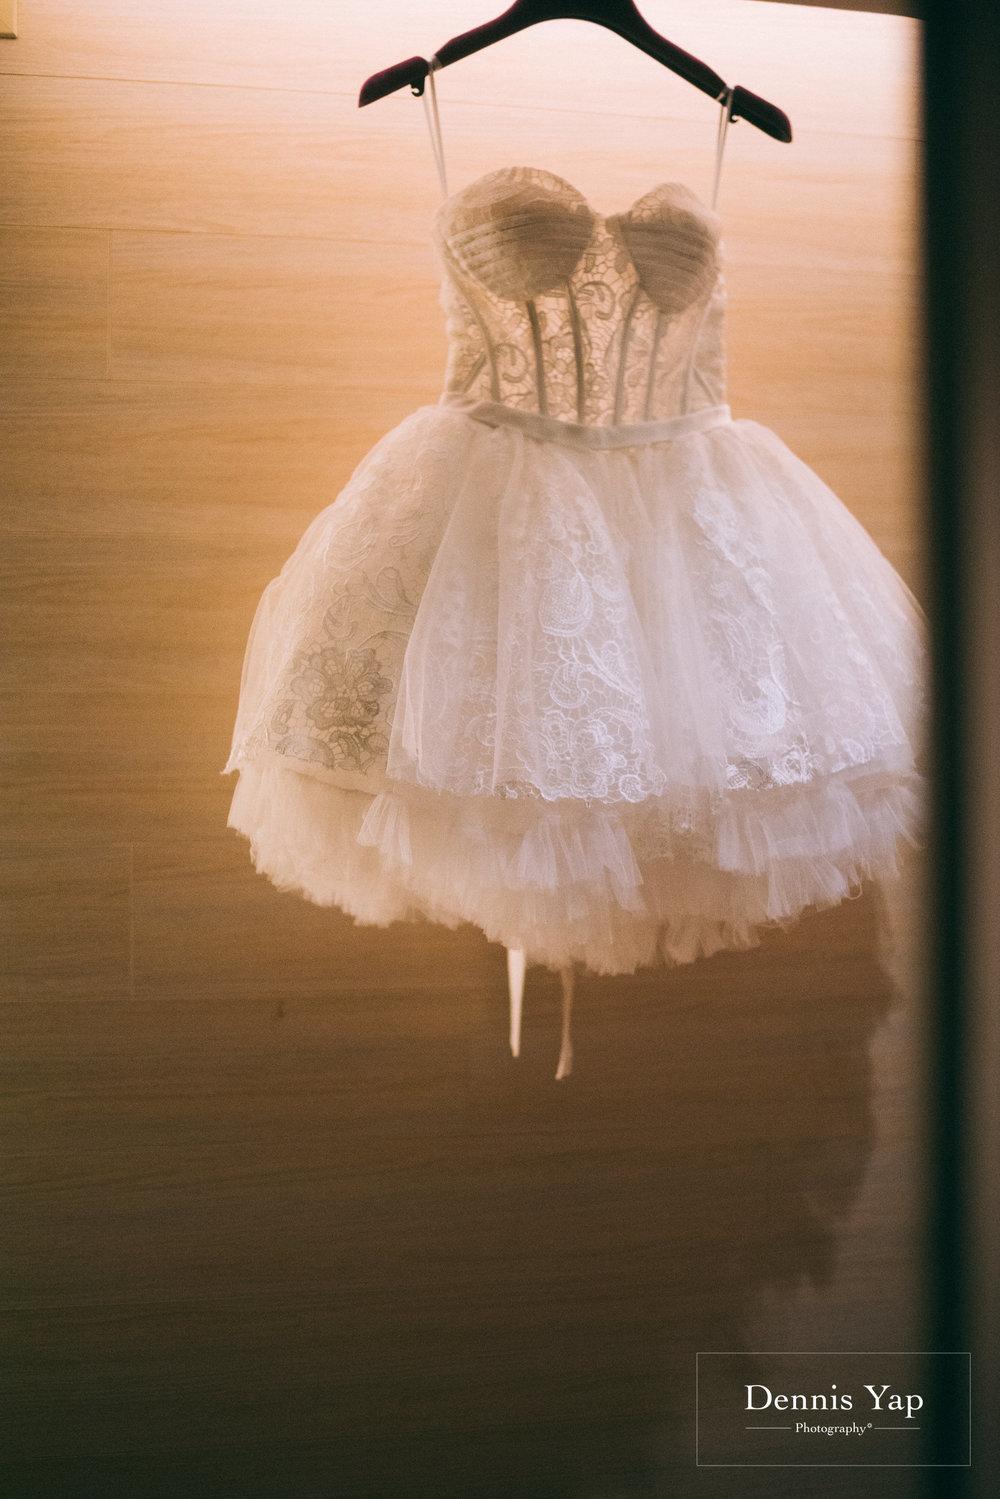 alex eivan wedding day kuala lumpur malaysia dennis yap photography short gown-1.jpg